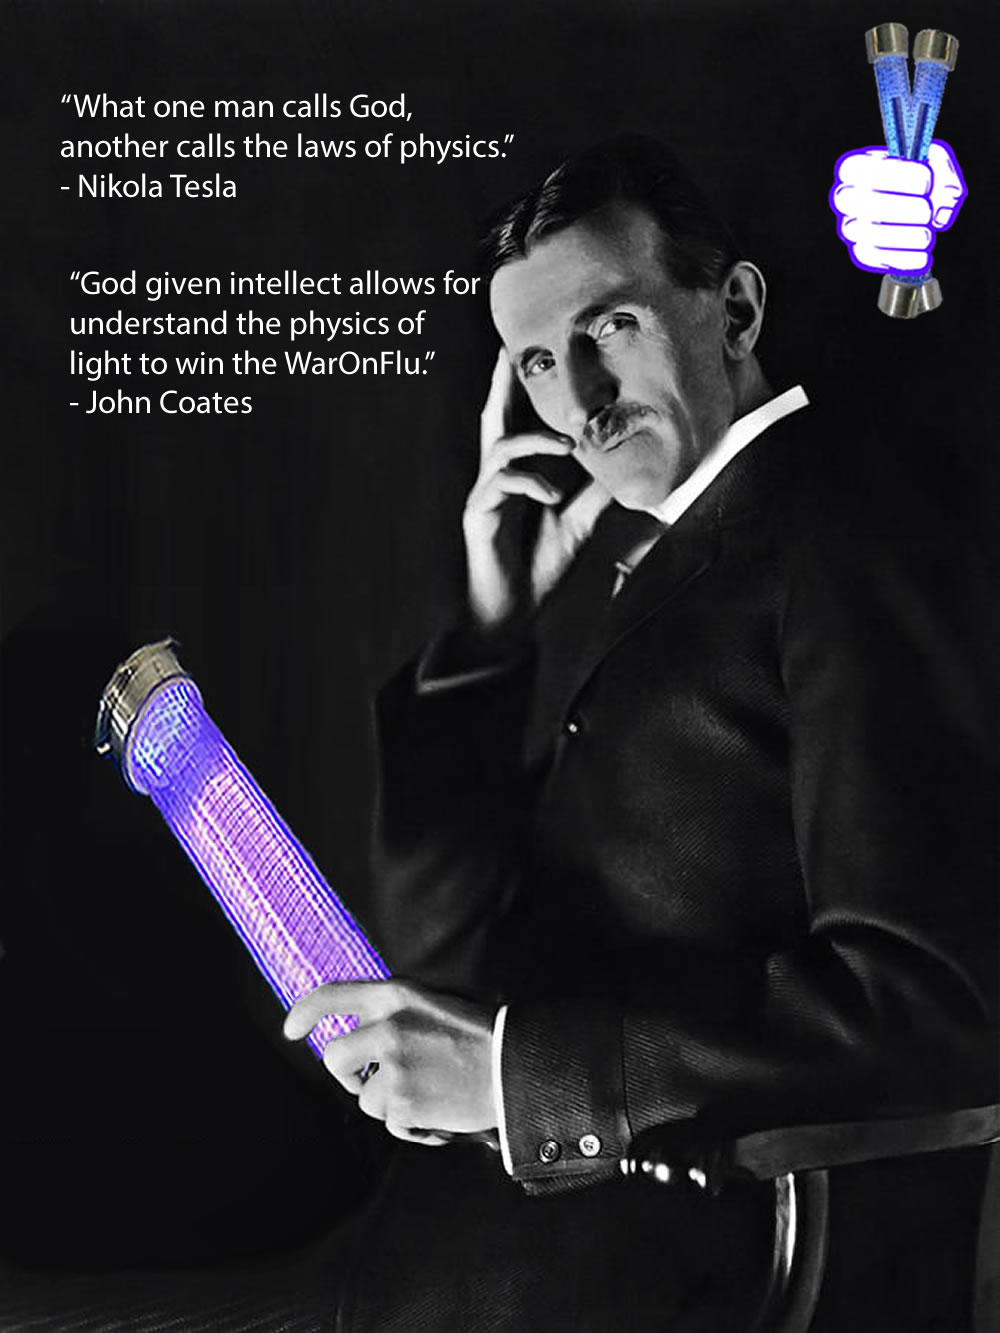 john-coates-quote-far-uvc-light-Nikola-Tesla-far-uvc-222nm-Light-beam-shield-highlander-em-shield-war-on-flu-excimer-krcl-lamps-high-frequency-virus-shield